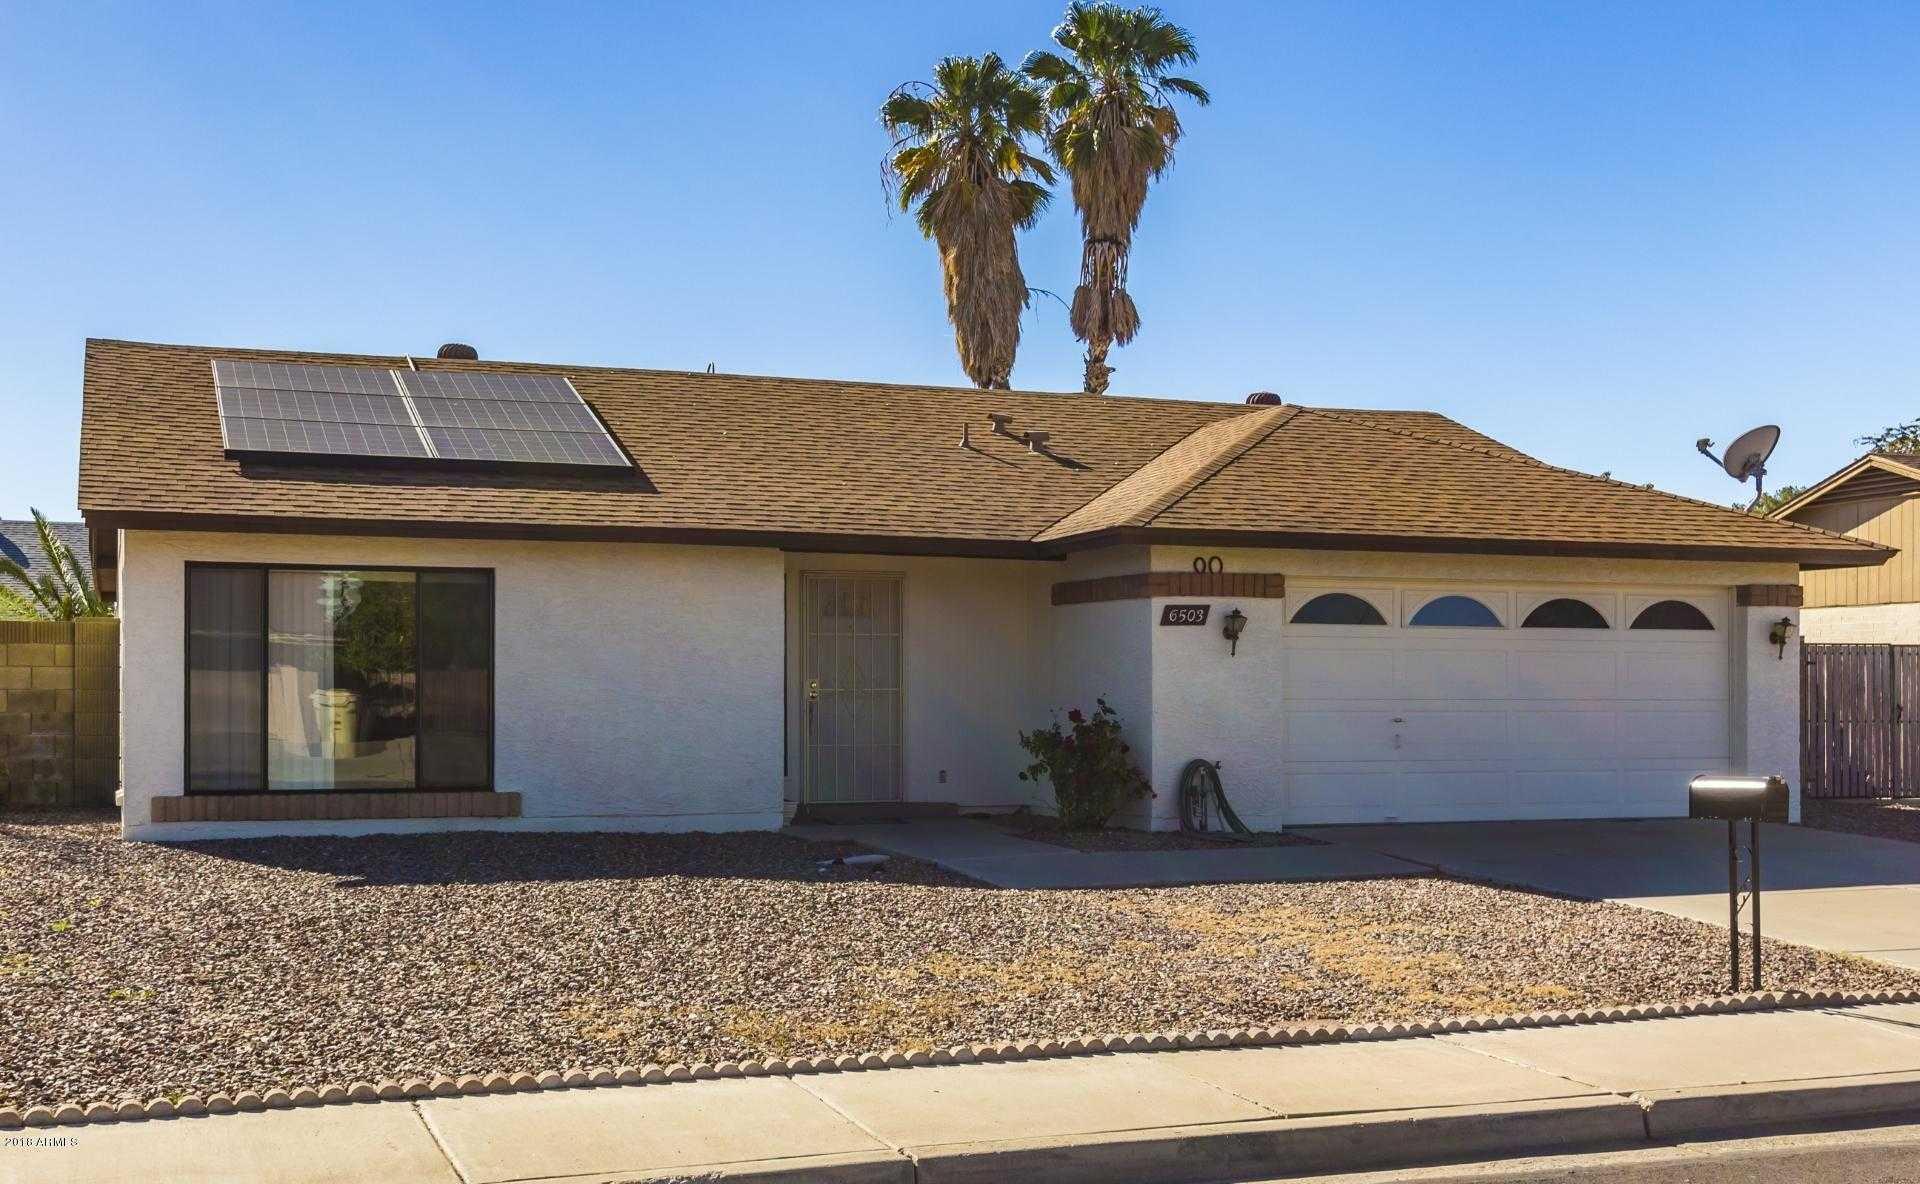 $234,000 - 3Br/2Ba - Home for Sale in Daybreak Unit 3 Lot 19-99, Glendale